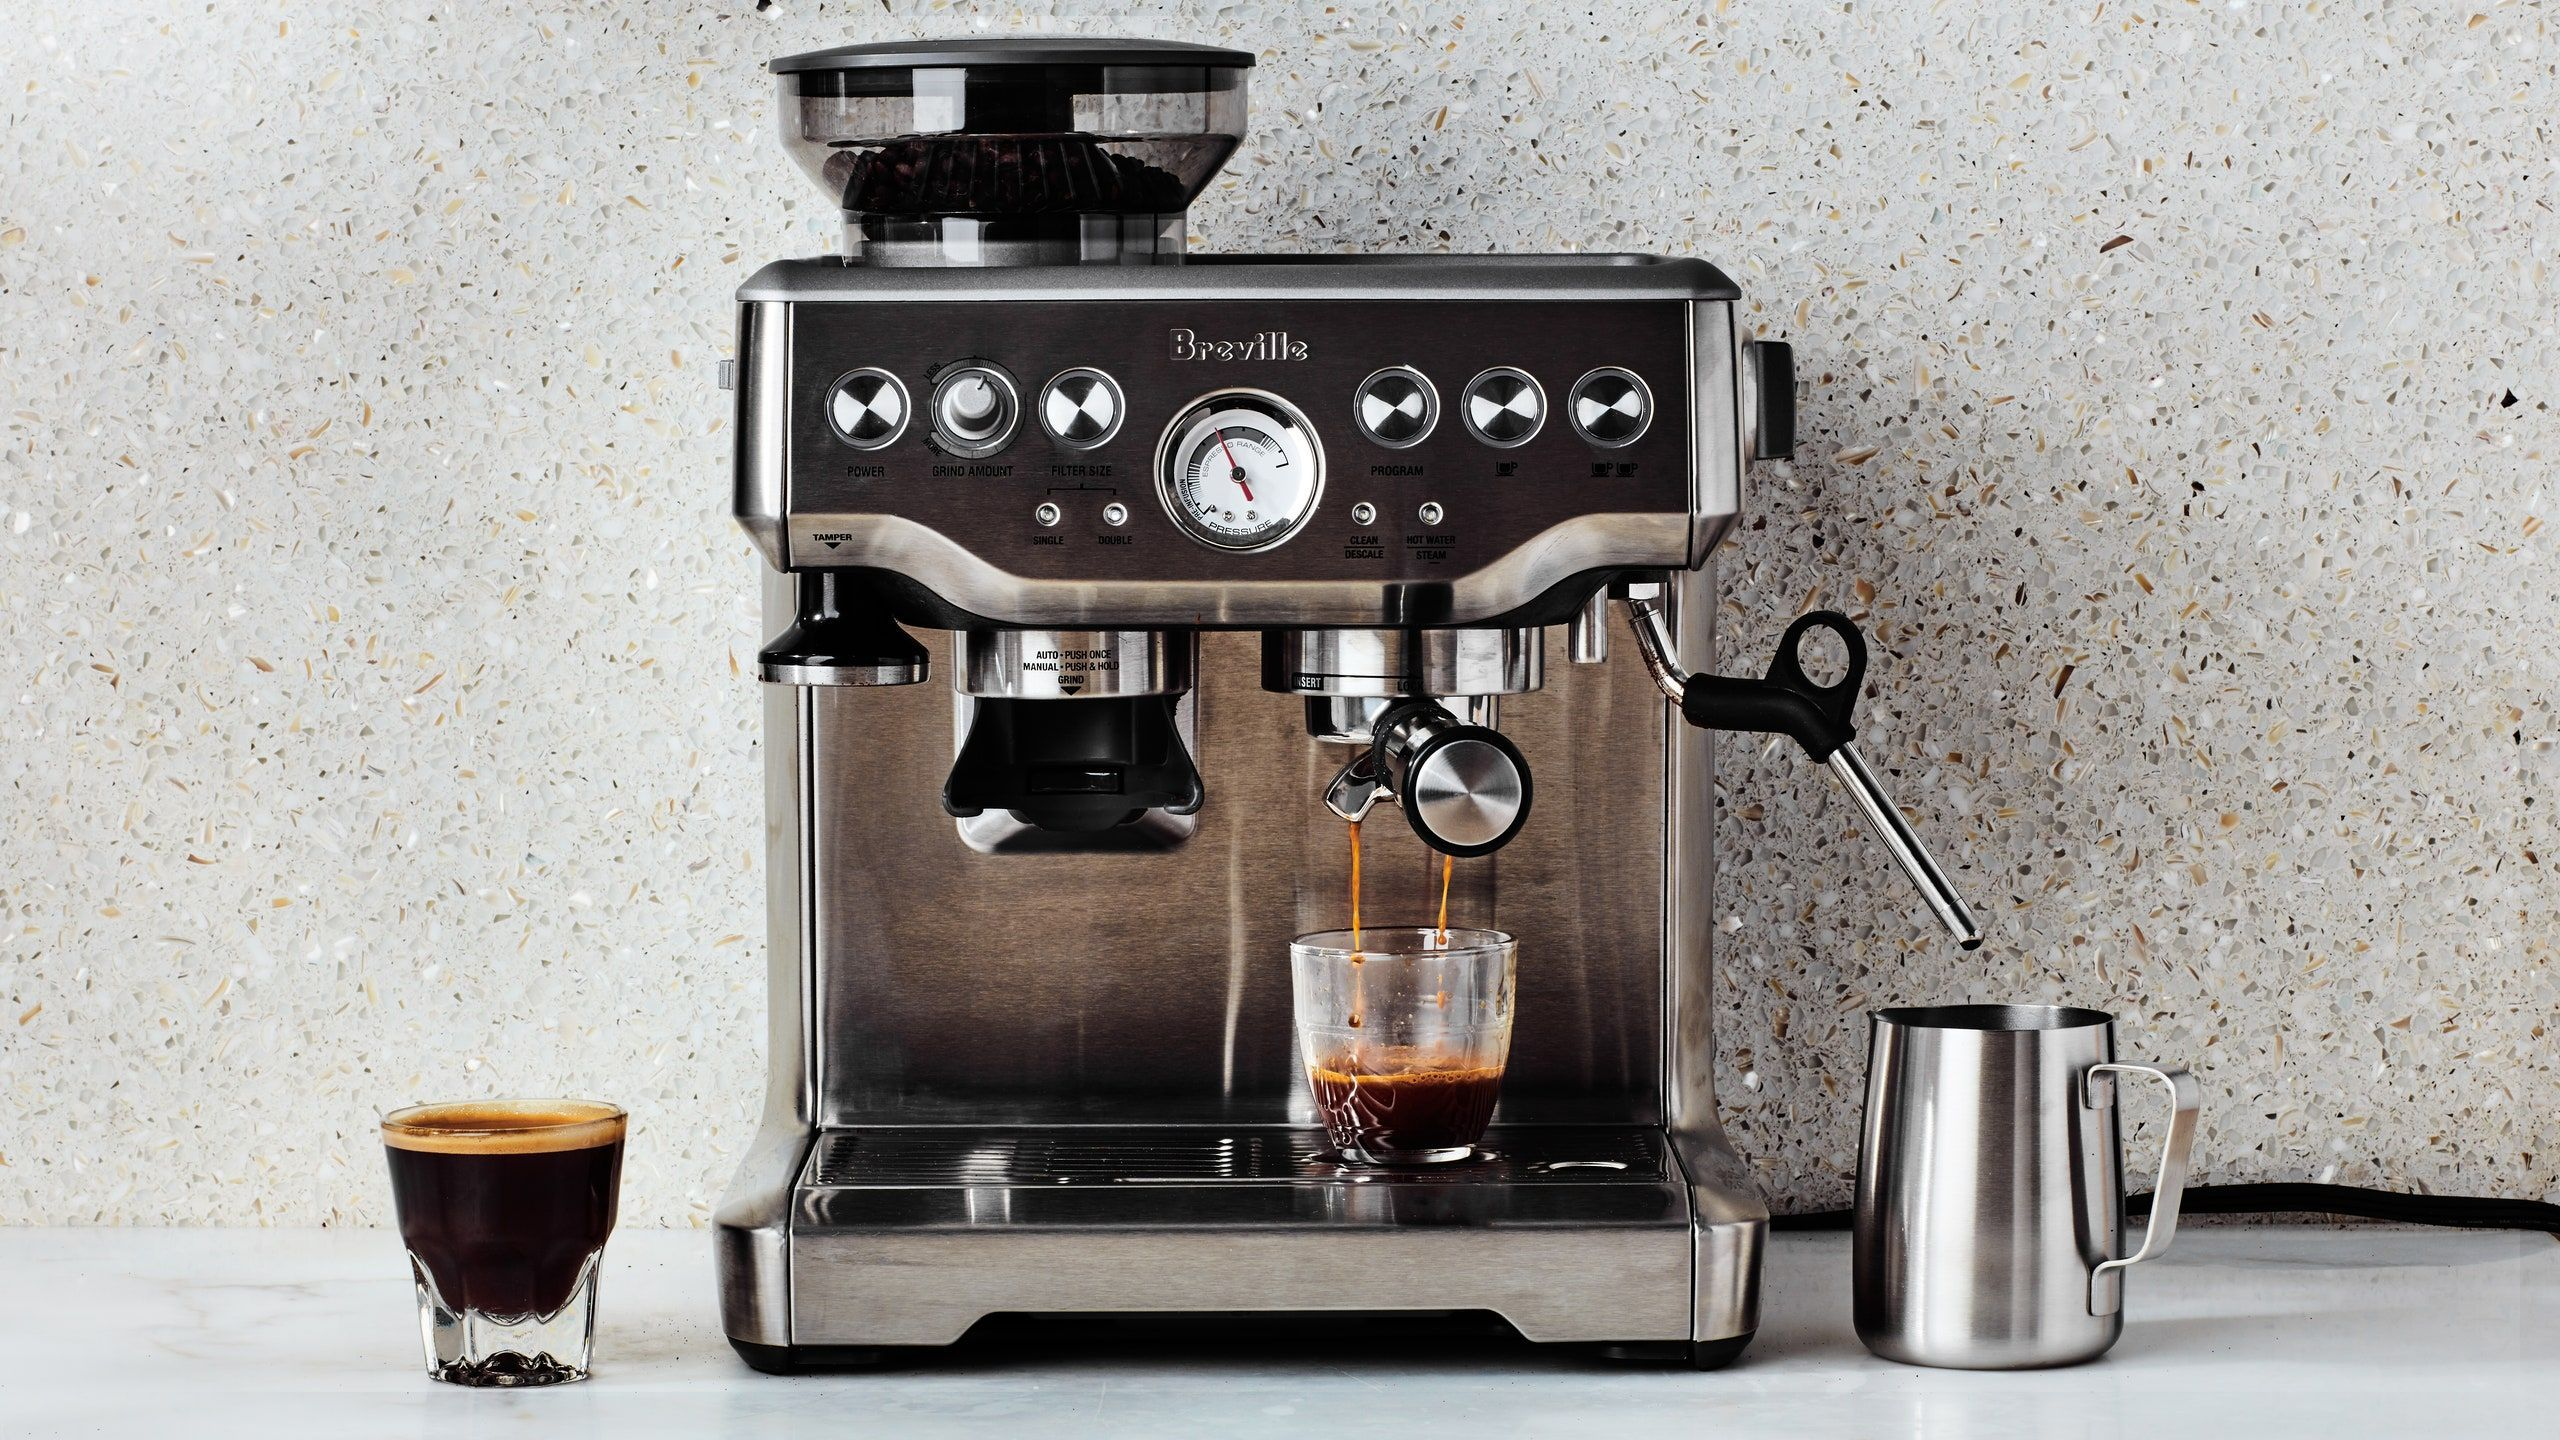 Jura Coffee Machine Black Friday Sale 2019 Massive Discount Juracoffeemachine Jura Coffee Machin In 2020 Jura Coffee Machine Filter Coffee Machine Coffee Machine